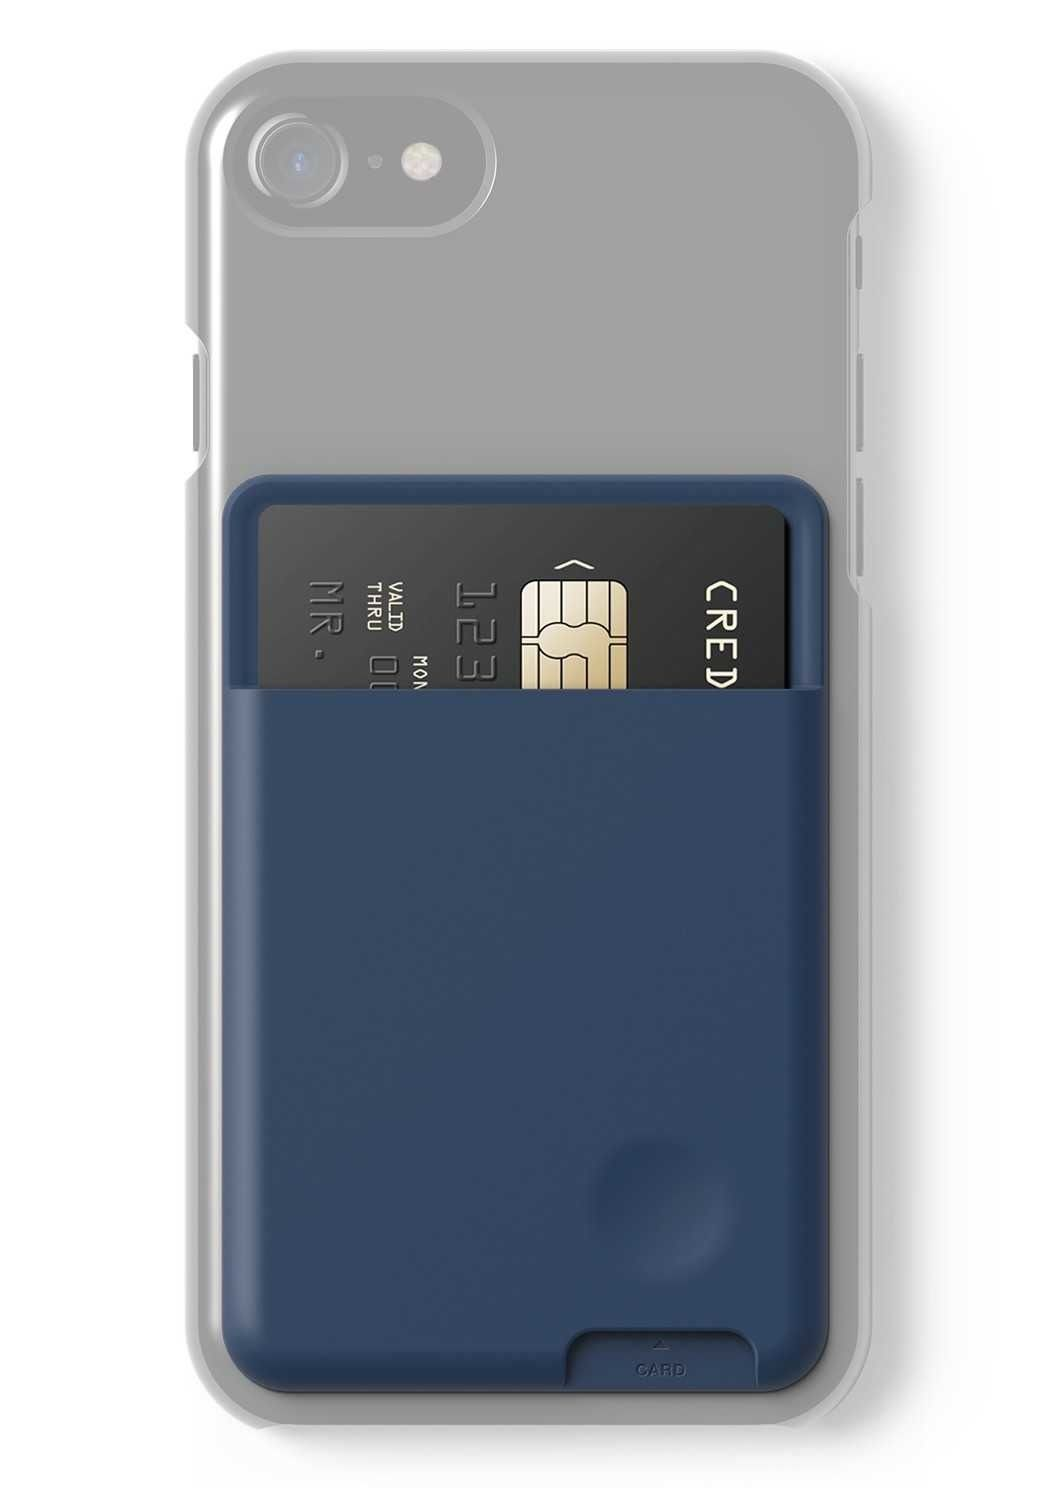 إيلاجو Smartphone حافظة بطاقات, Jean Indigo